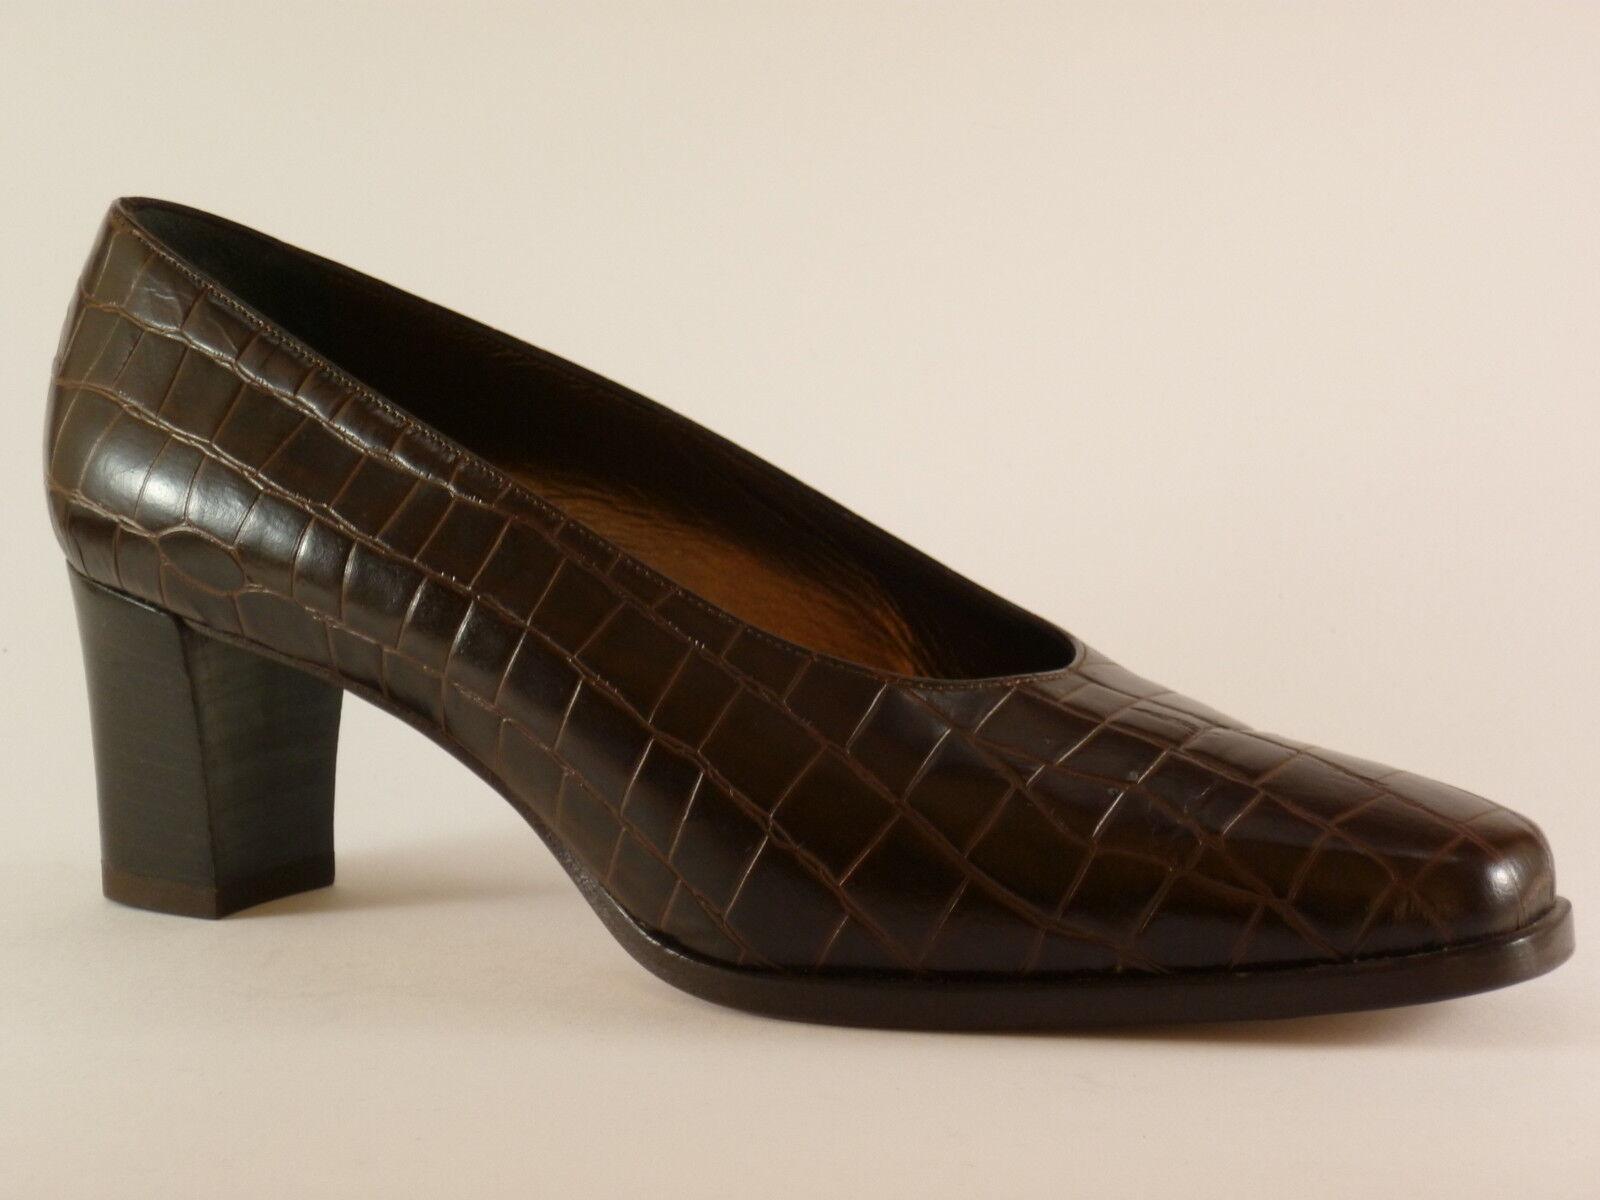 Marcello Giovannetti Chaussures Femmes 39 1 2 Cuir Marron de Soirée Escarpins